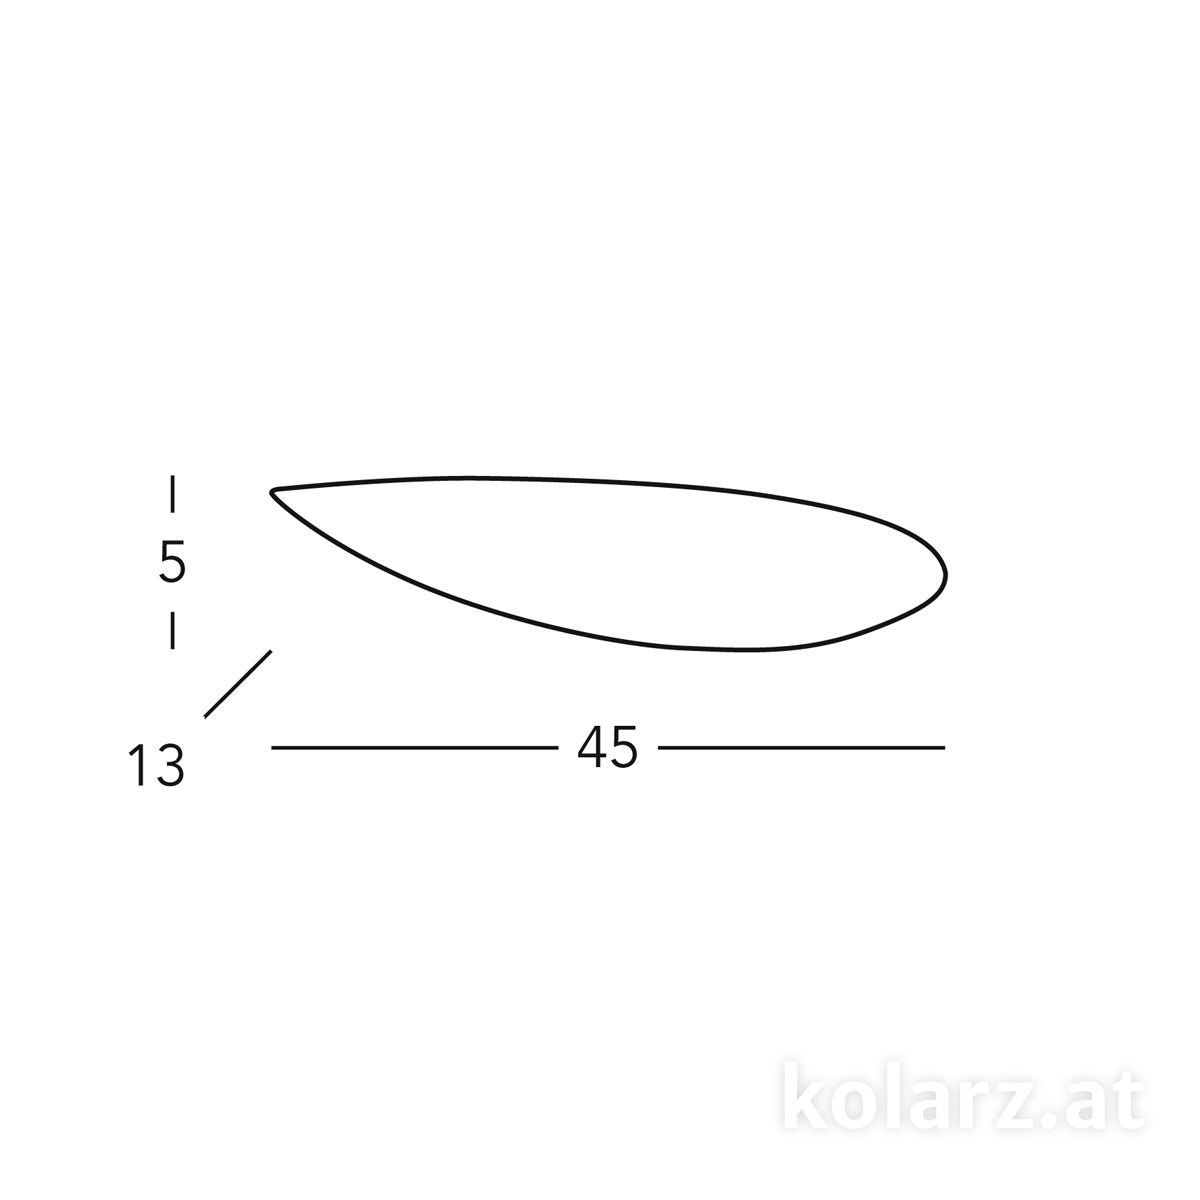 219-60-1-s1.jpg